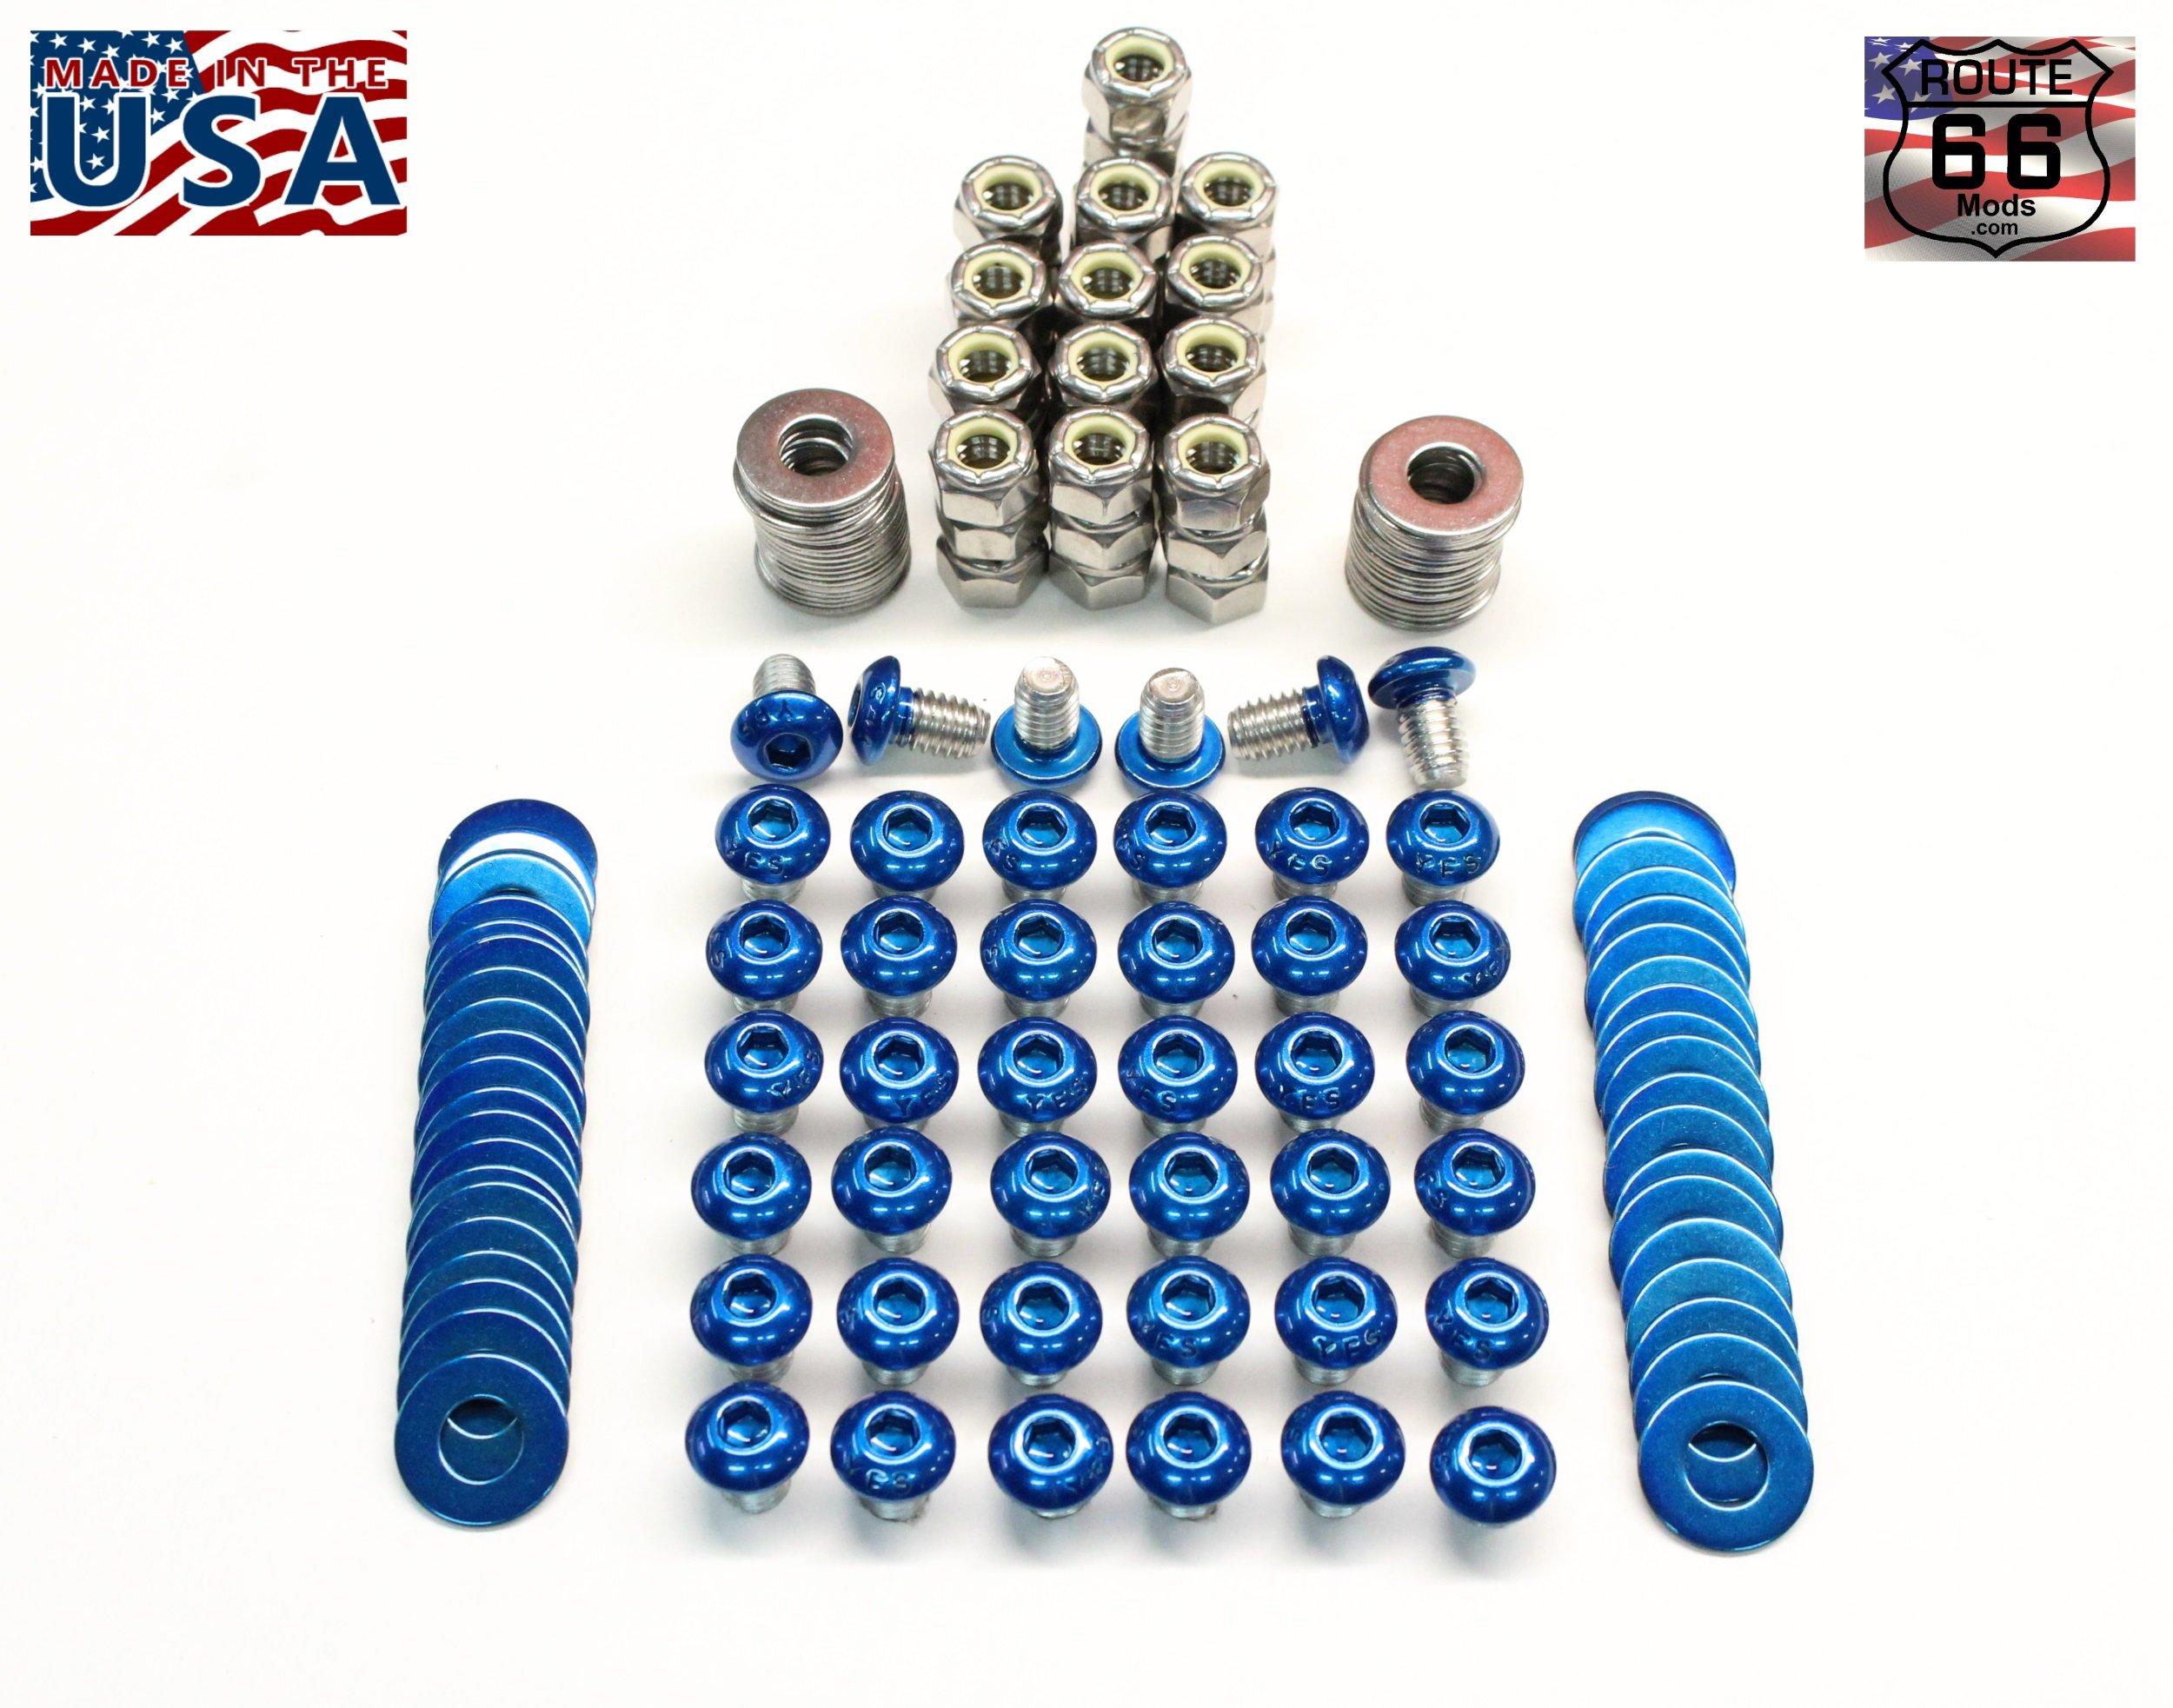 Route66Mods Powder Coated Screw/Bolt Set-Kit for Fender Flares - Pocket/Rivet Style Hardware (Candy Blue)